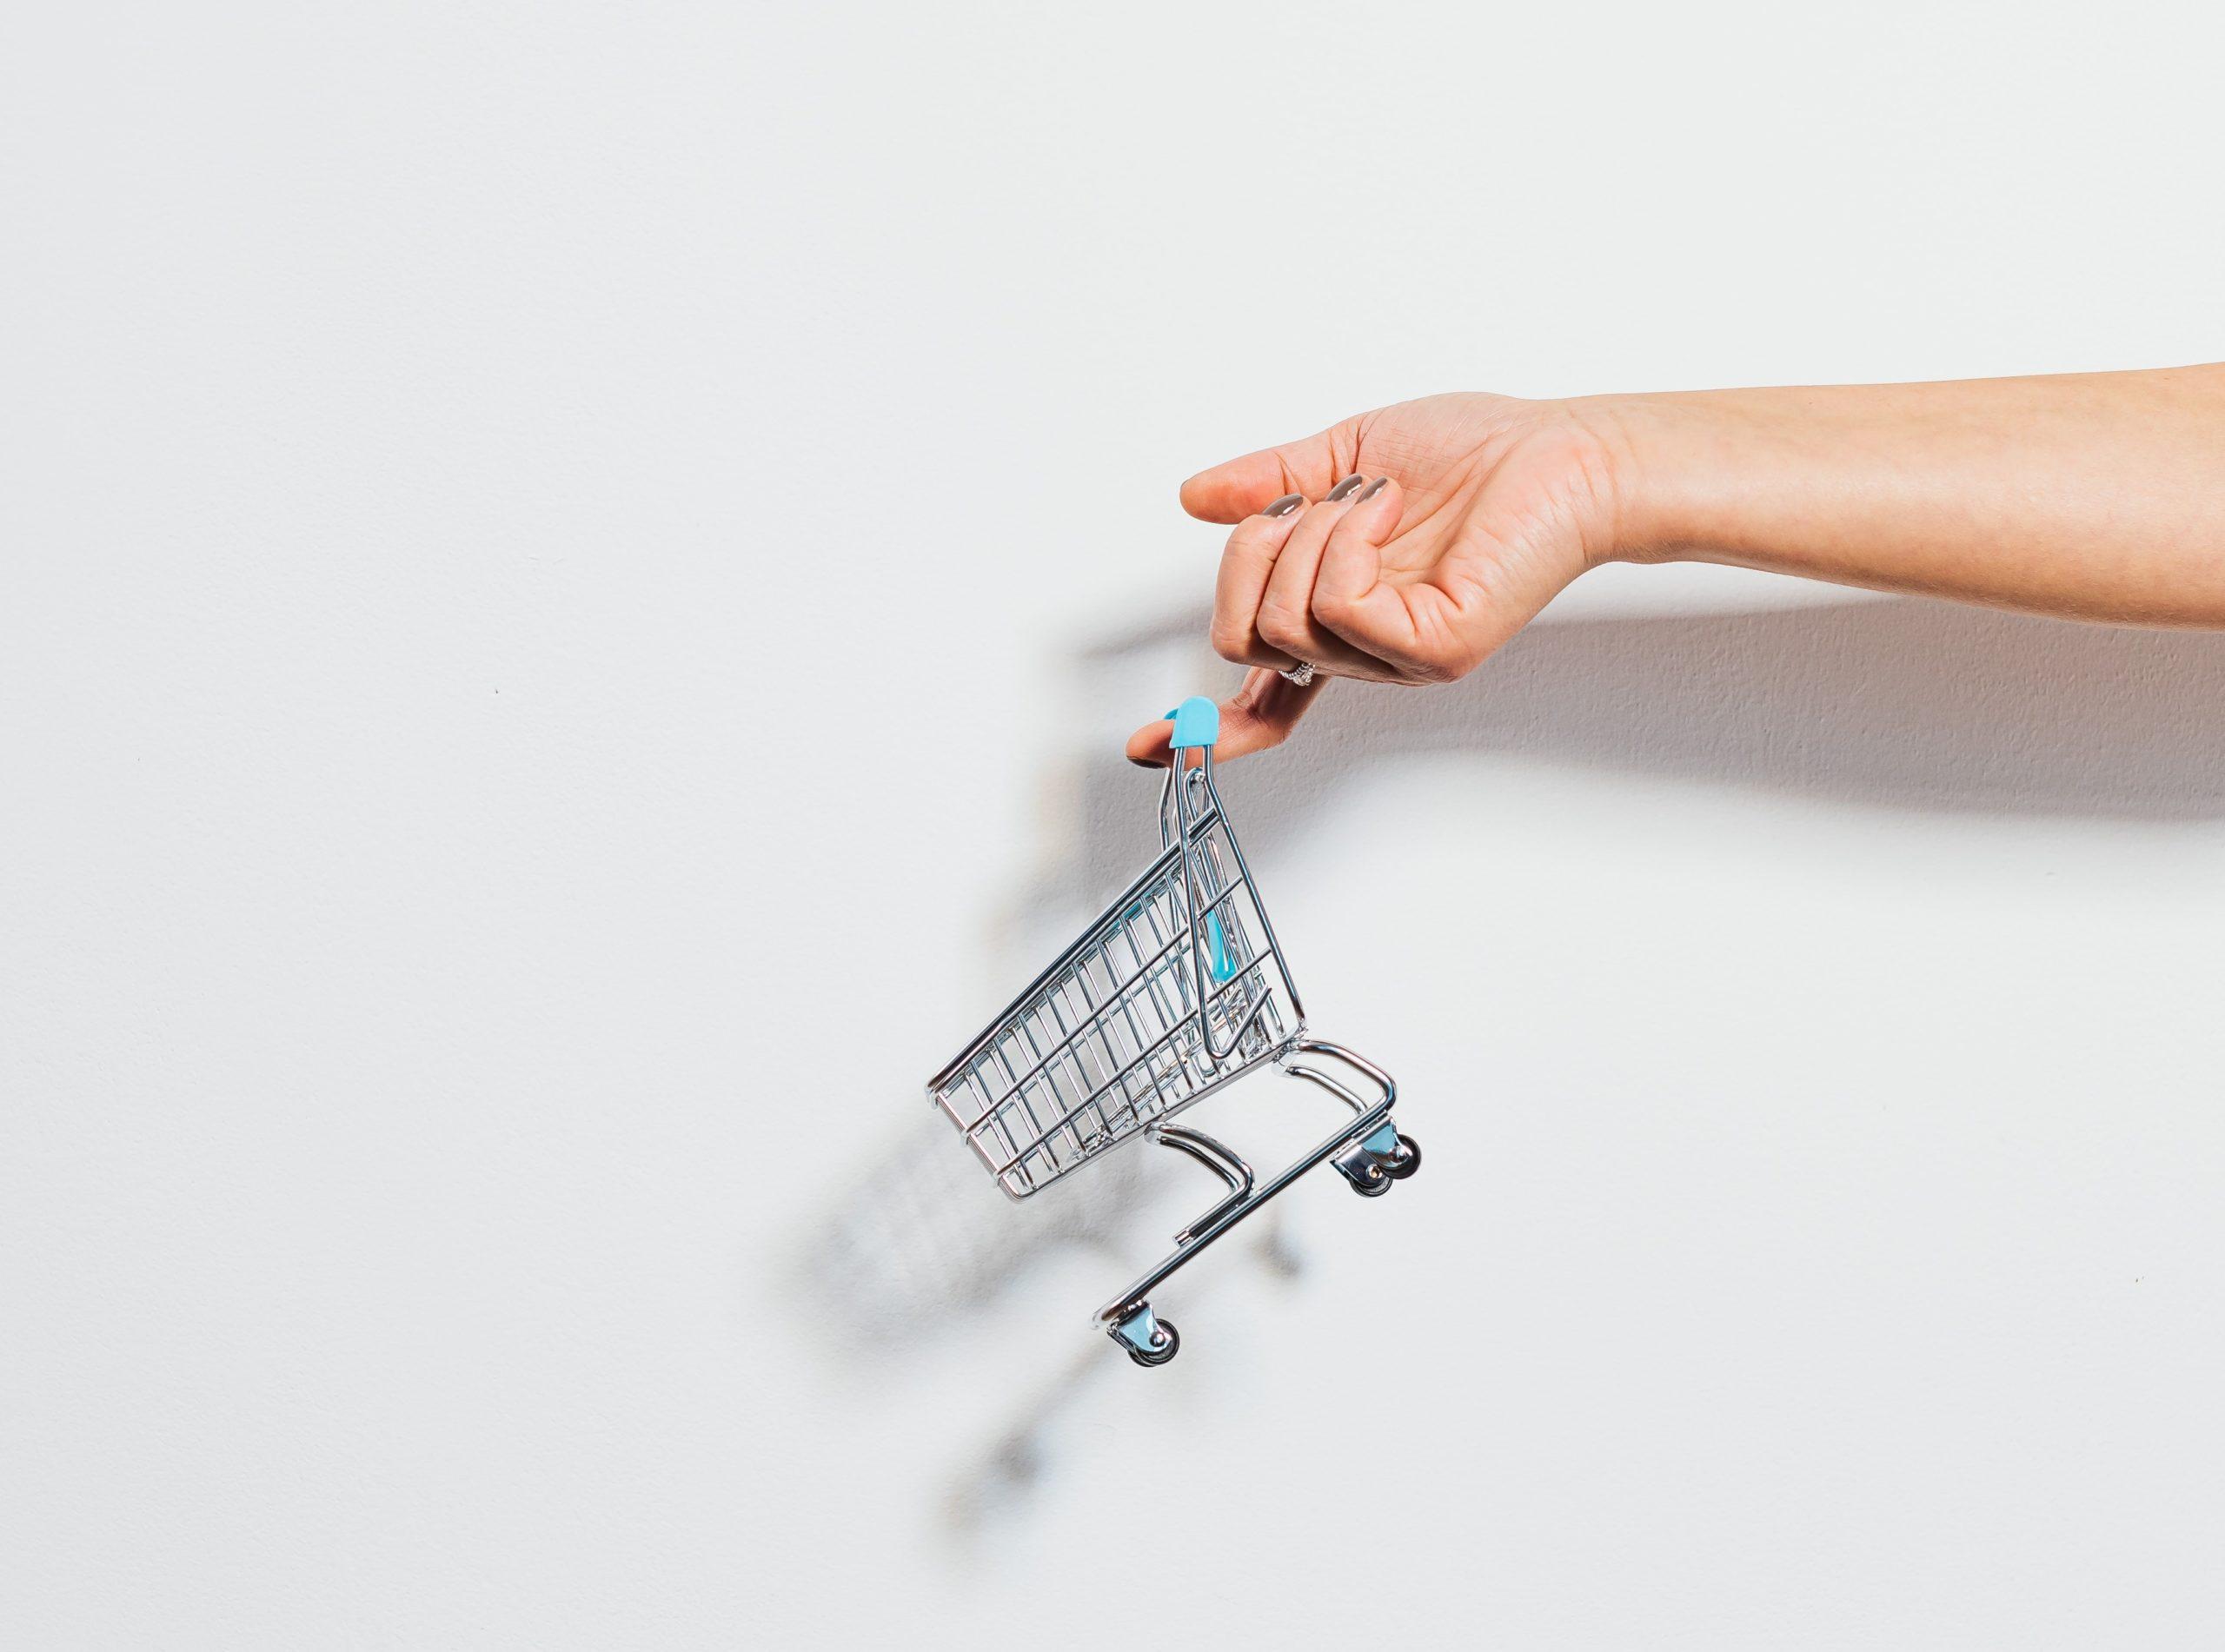 shopping cart, hand, hand holding shopping cart